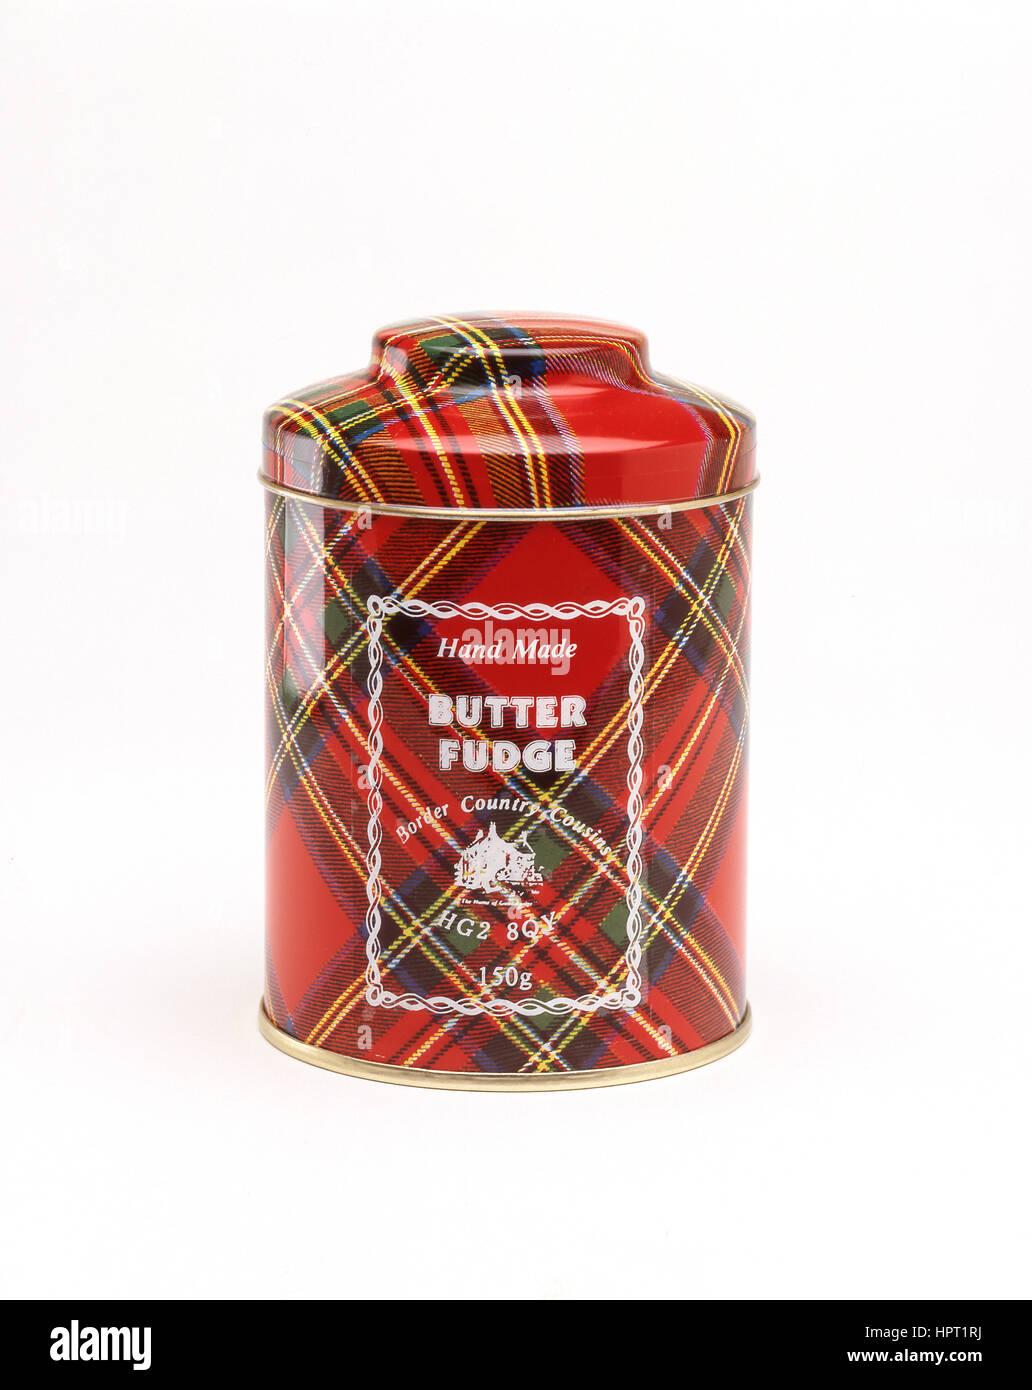 Hand made Scottish butter fudge, Inverness, Scottish Highlands, Scotland, United Kingdom Stock Photo